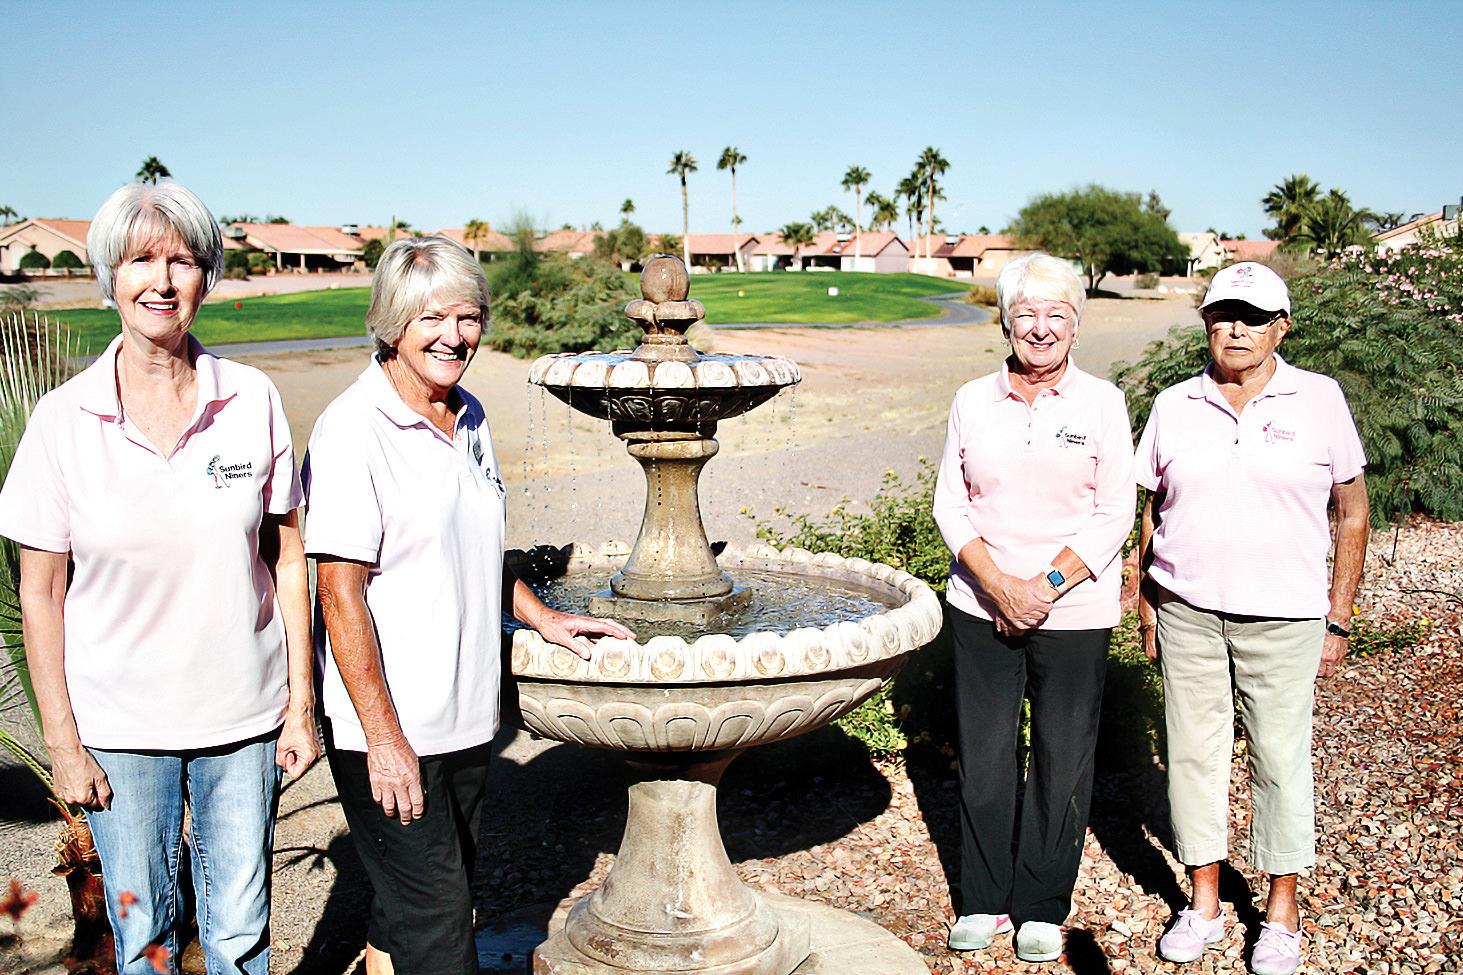 Meet the new 2021 SunBird Ladies Golfing Niners Board (left to right): Secretary Gail Schroeder, President Babs Cyr, President-Elect Pam Tiffany, and Treasurer Bev Wilson.